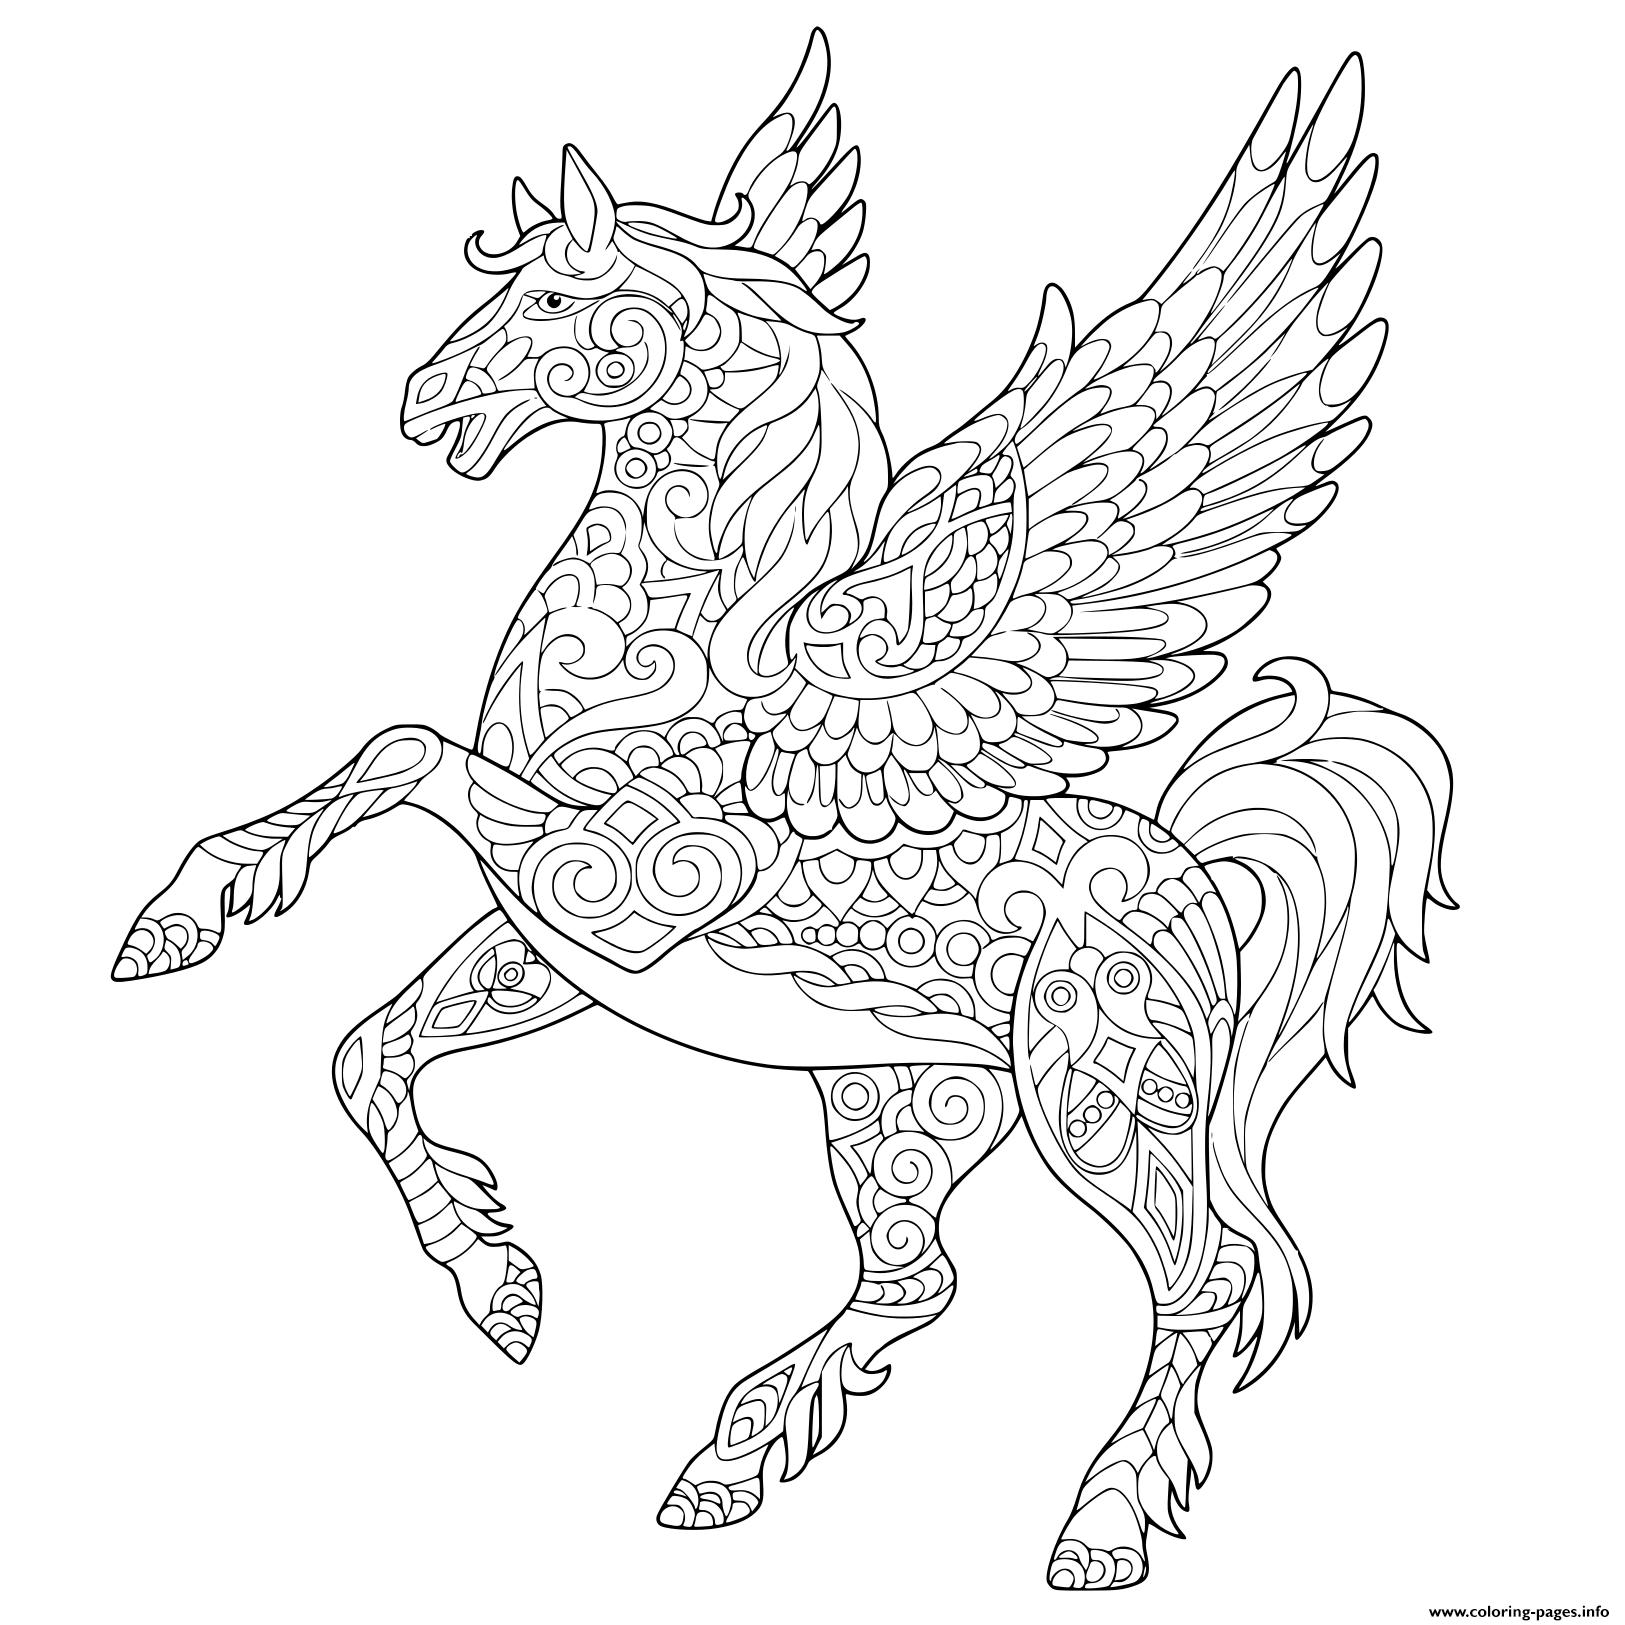 Pegasus Greek Mythological Winged Horse Flying Coloring Pages